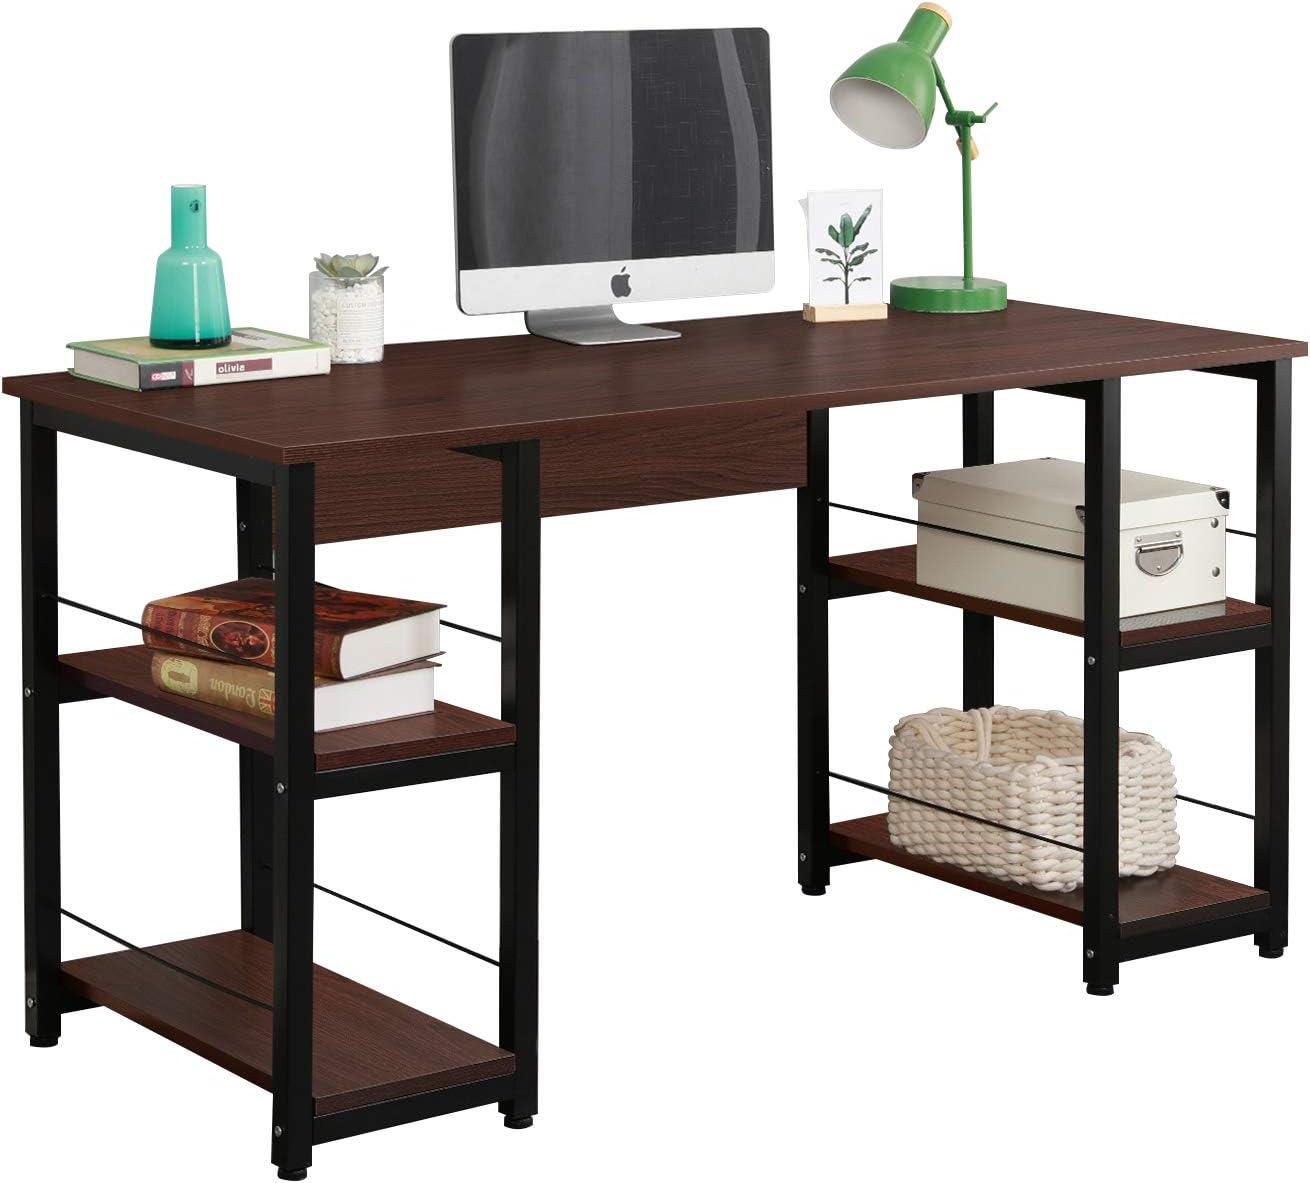 Soges Home Office Desk